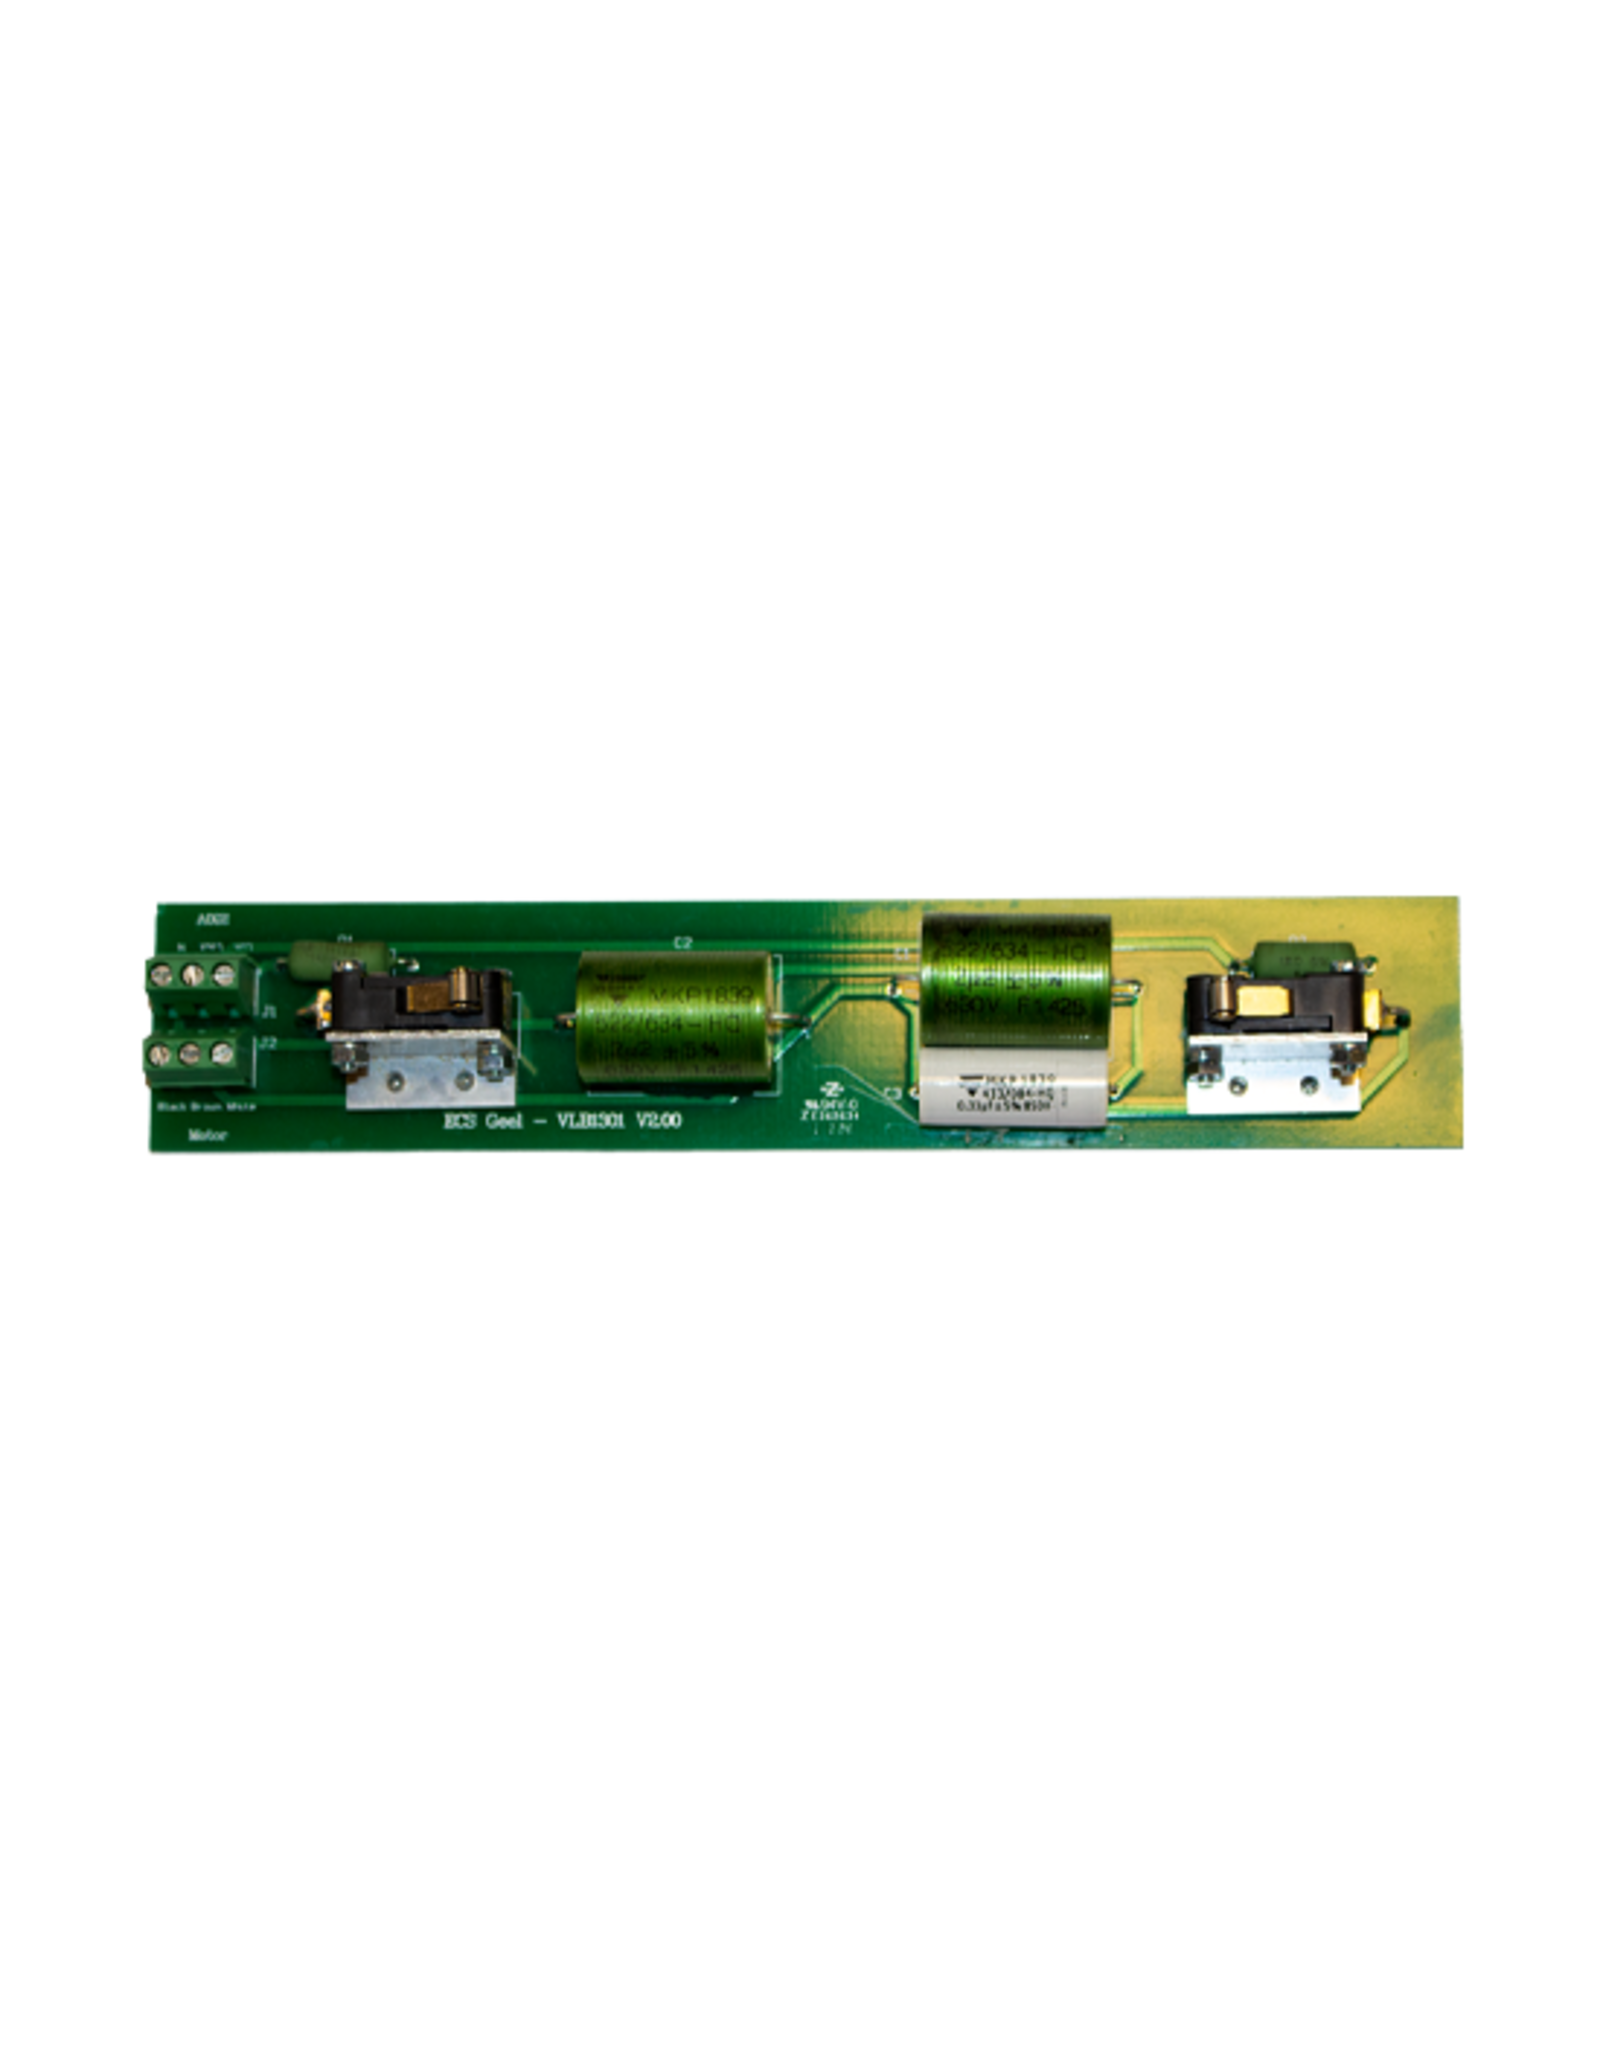 VLB Bread Slicers Printed circuit board Elmeq